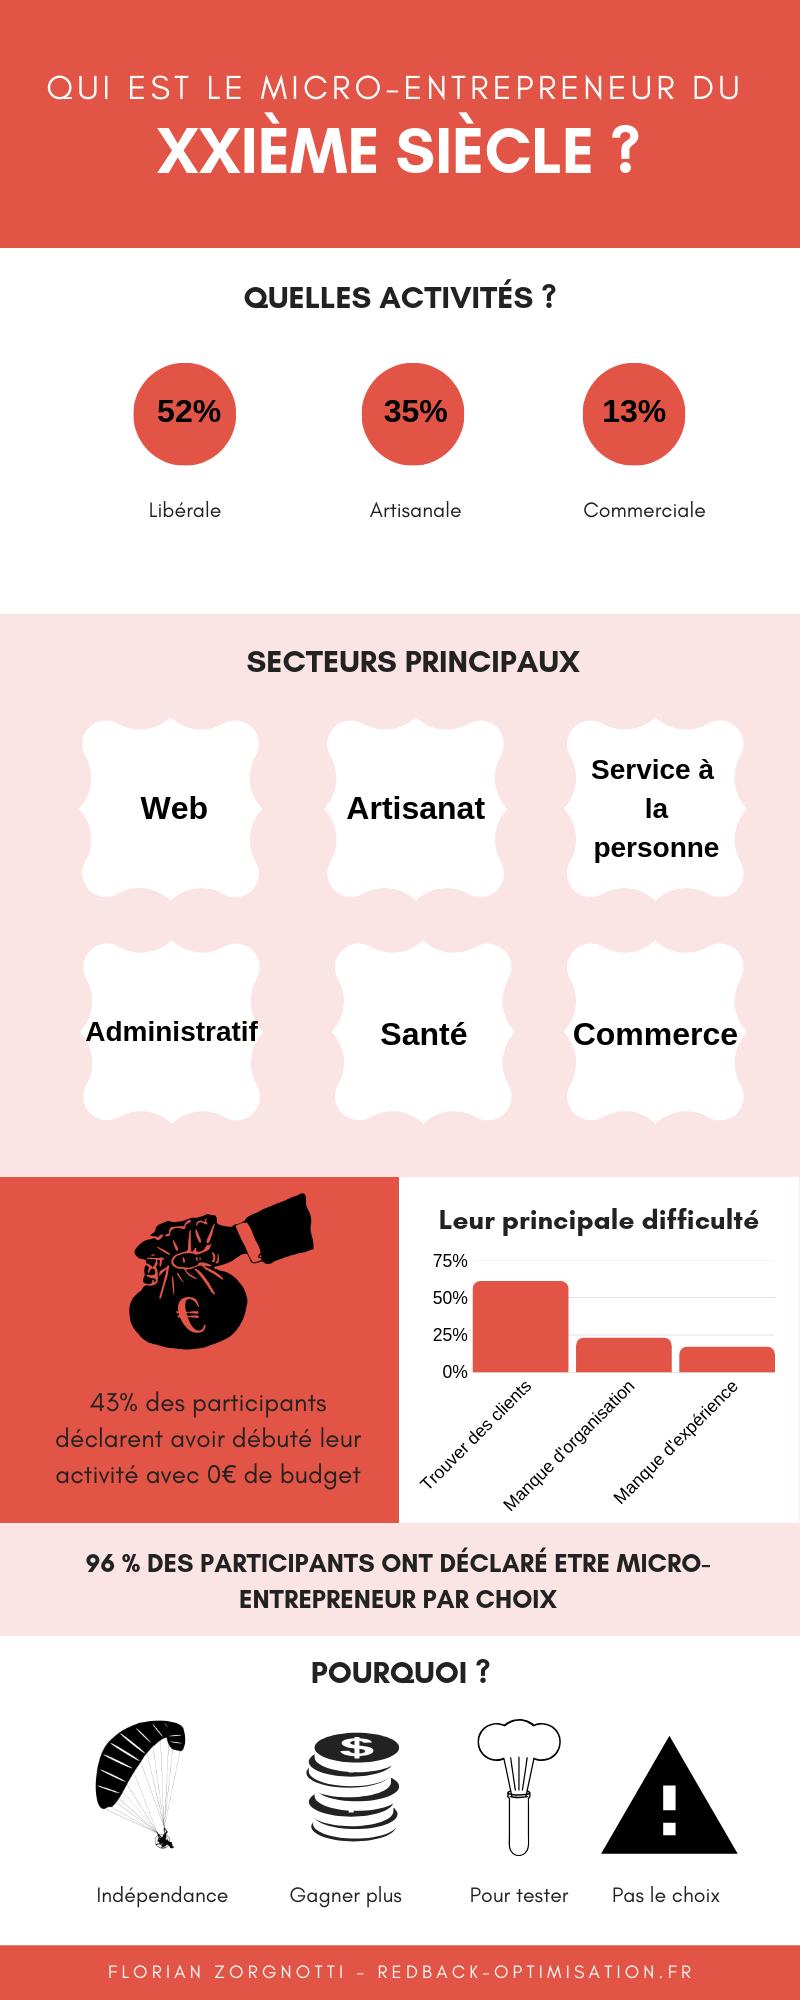 Micro entrepreneur 2019 (1)